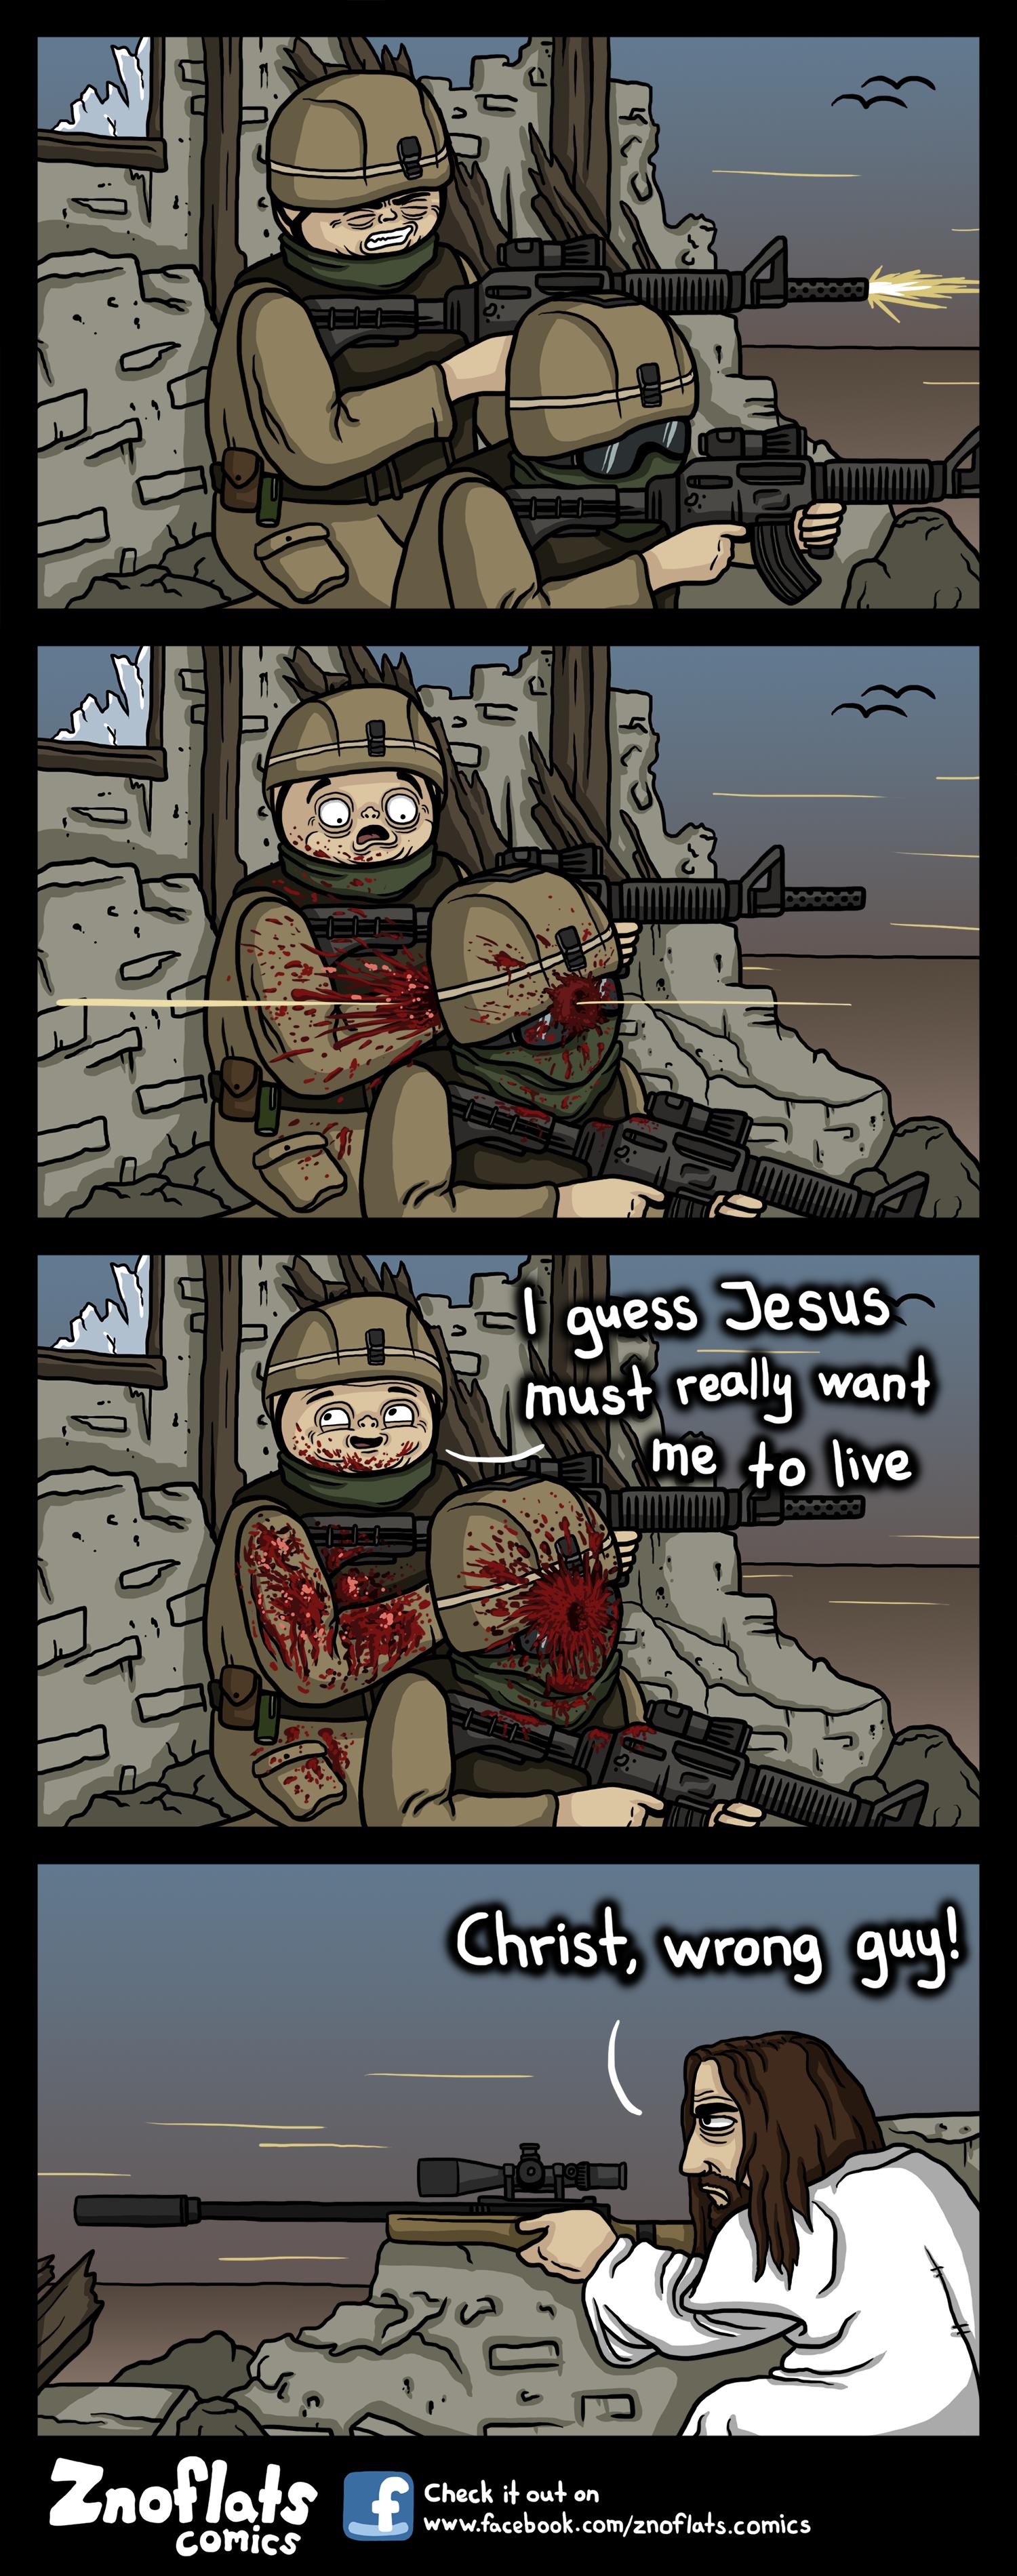 Jesus, din jävla slyna. www.facebook.com/Znoflats.Comics?ref=hl. znoflatscomics Znoflats lick my asshole